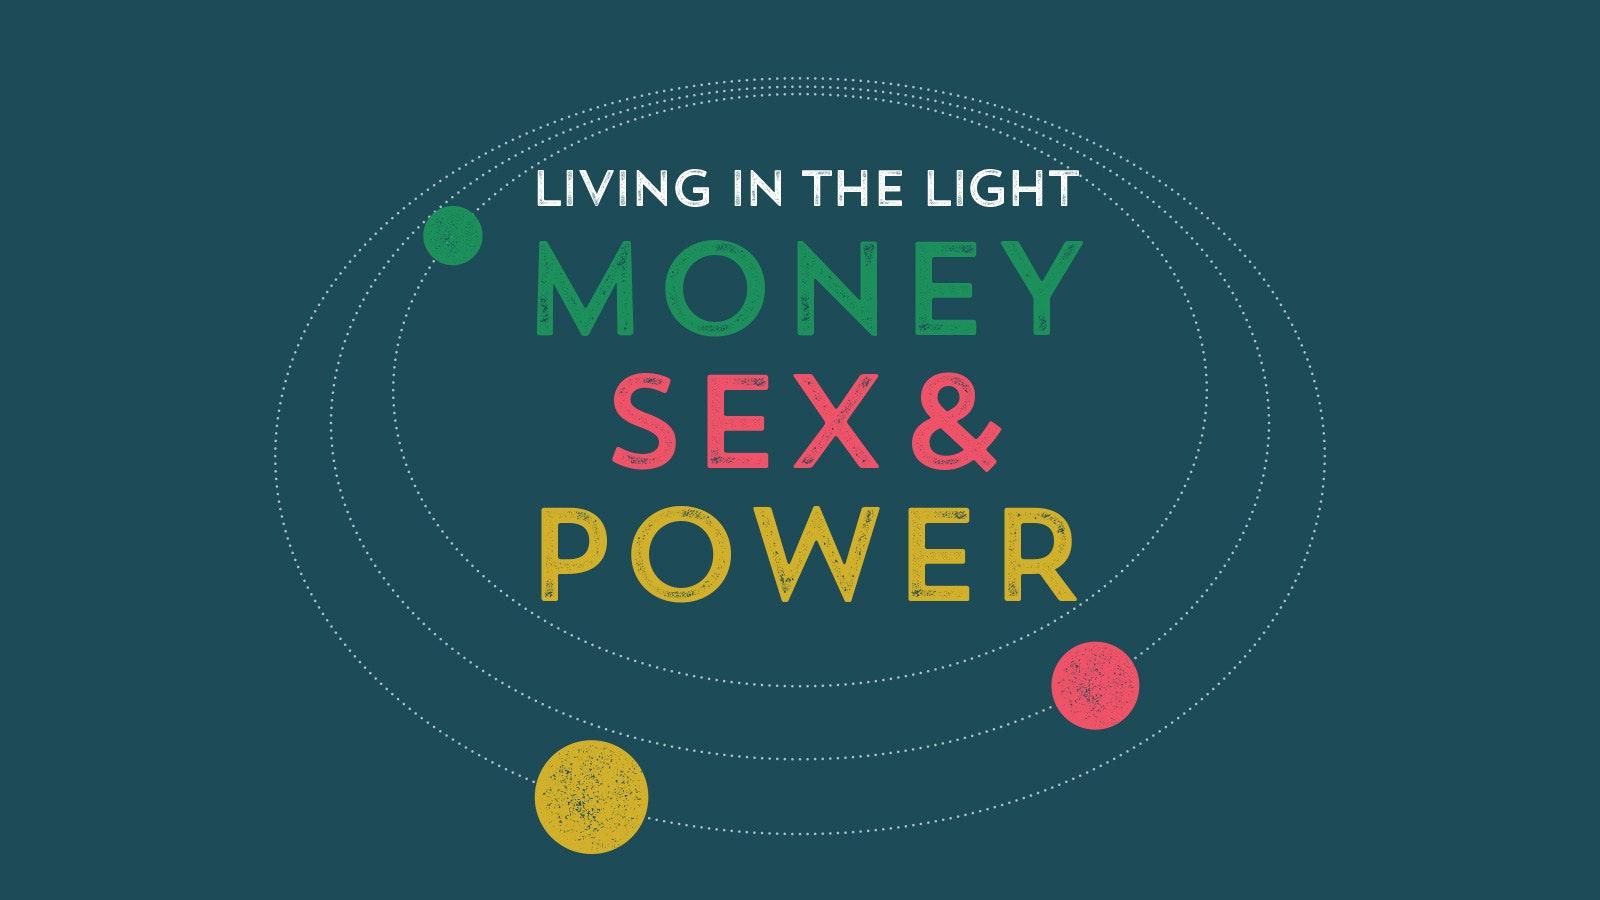 Power money lust sex the articule